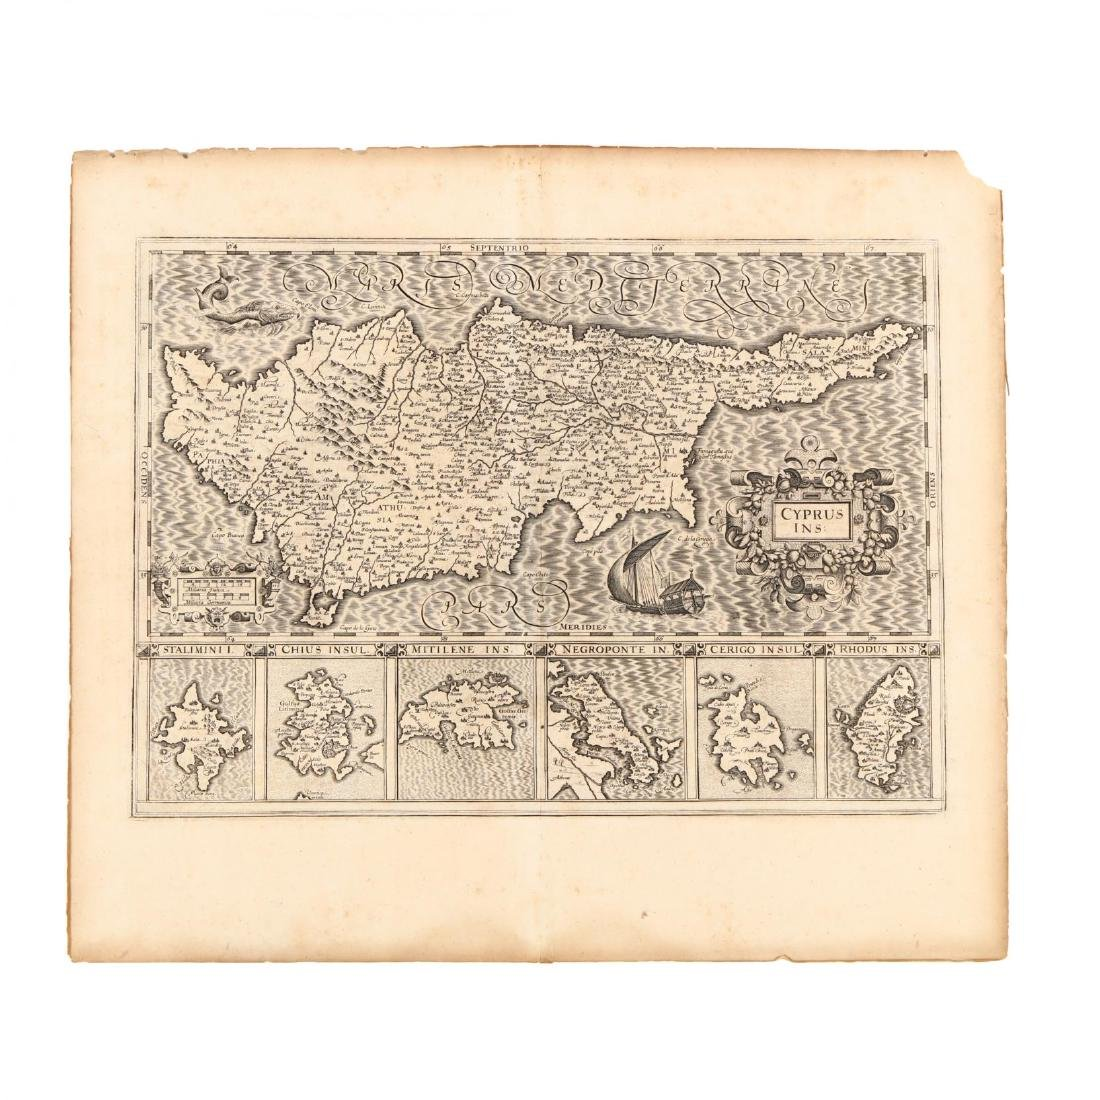 Hondius, Joducius and Mercator, Gerard.  Cyprus Ins: